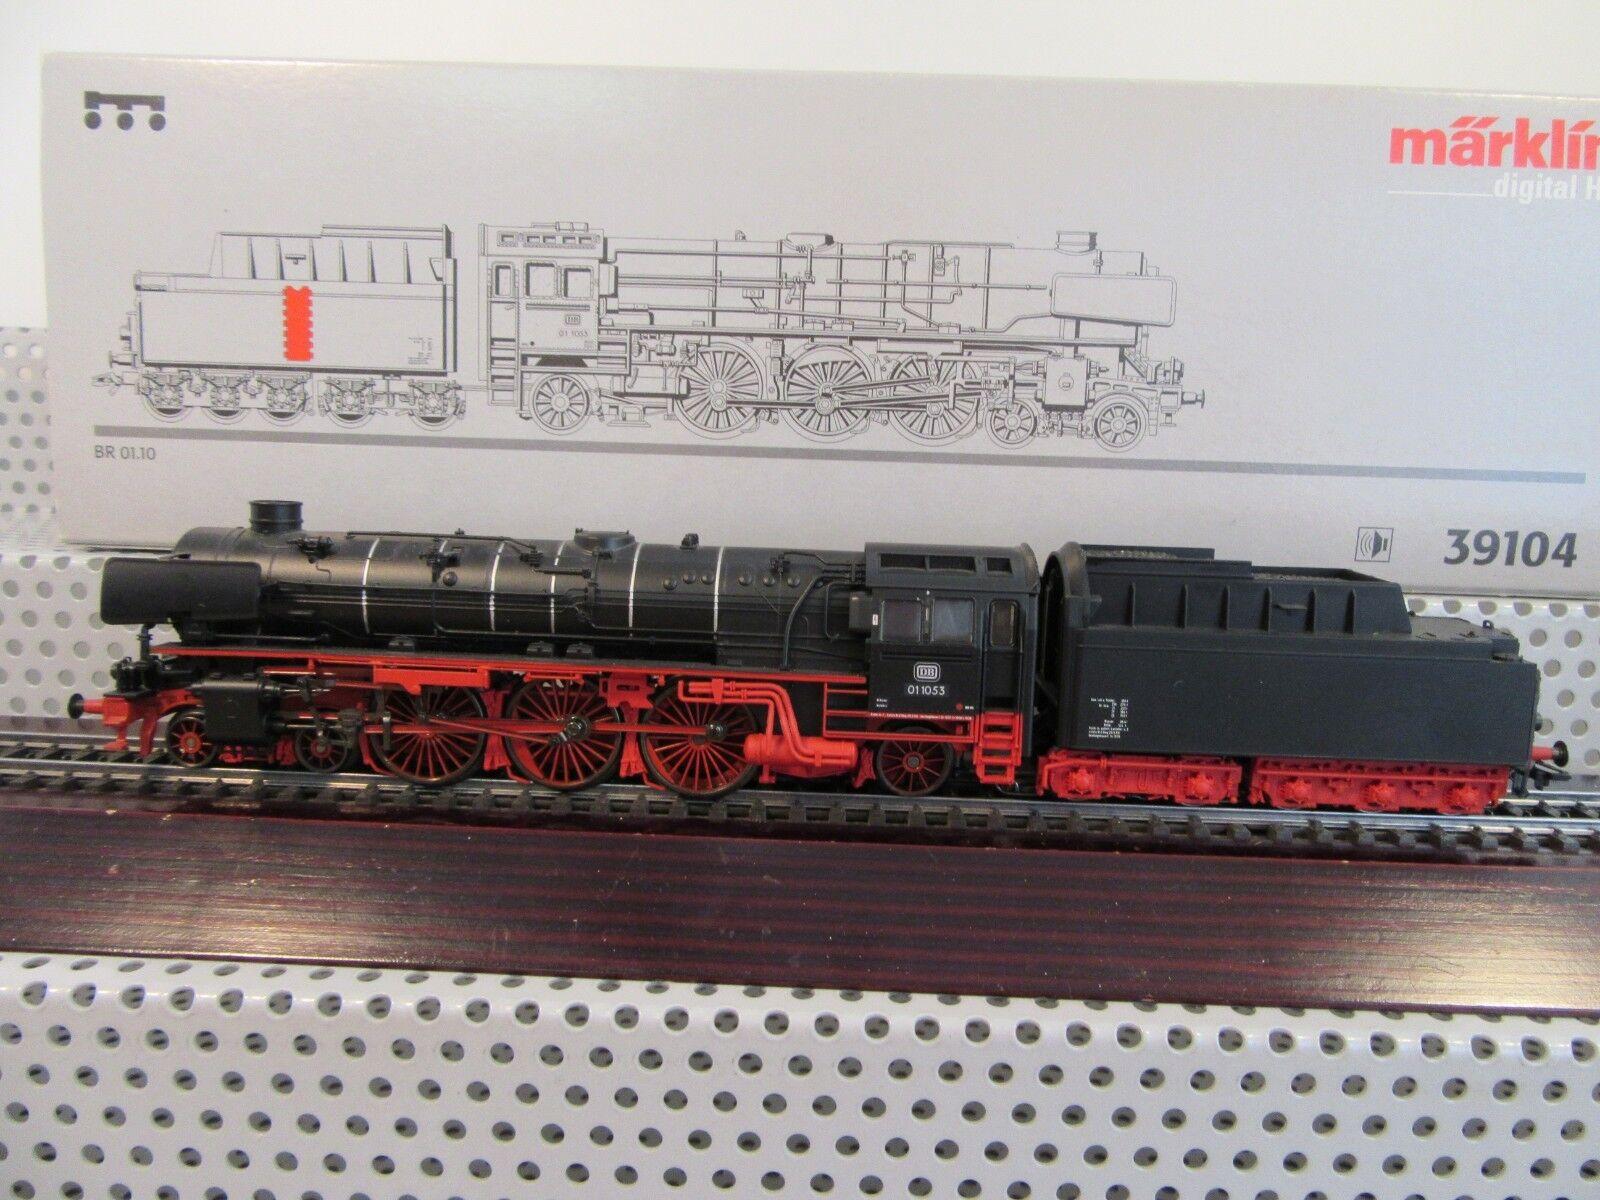 h0 39104 STILO Tender locomotiva BR 01 1053 delle DB digital sound in scatola originale 1ff58a